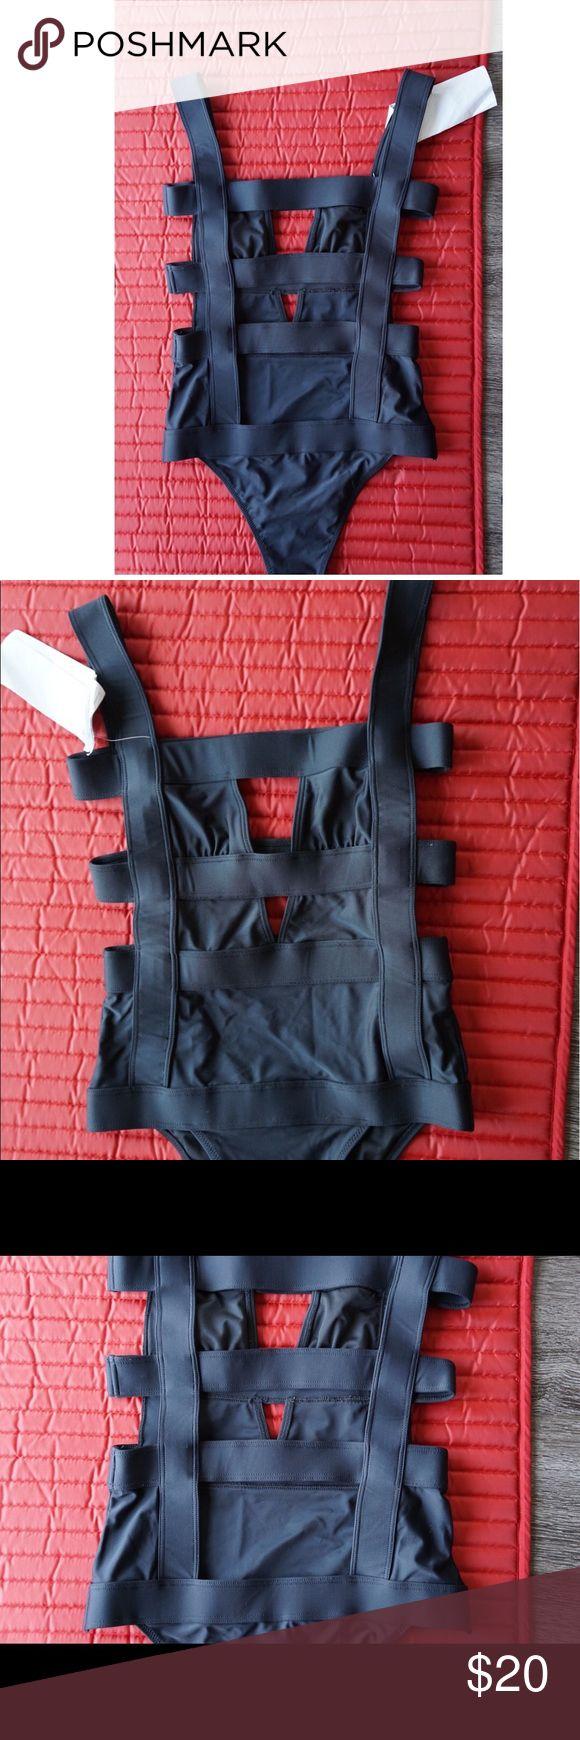 New Black cut out swimsuit SZ 2/4 SM Nasty Gal New black cut out swimsuit from Nasty Gal. Very cute and funky! Nasty Gal Swim One Pieces